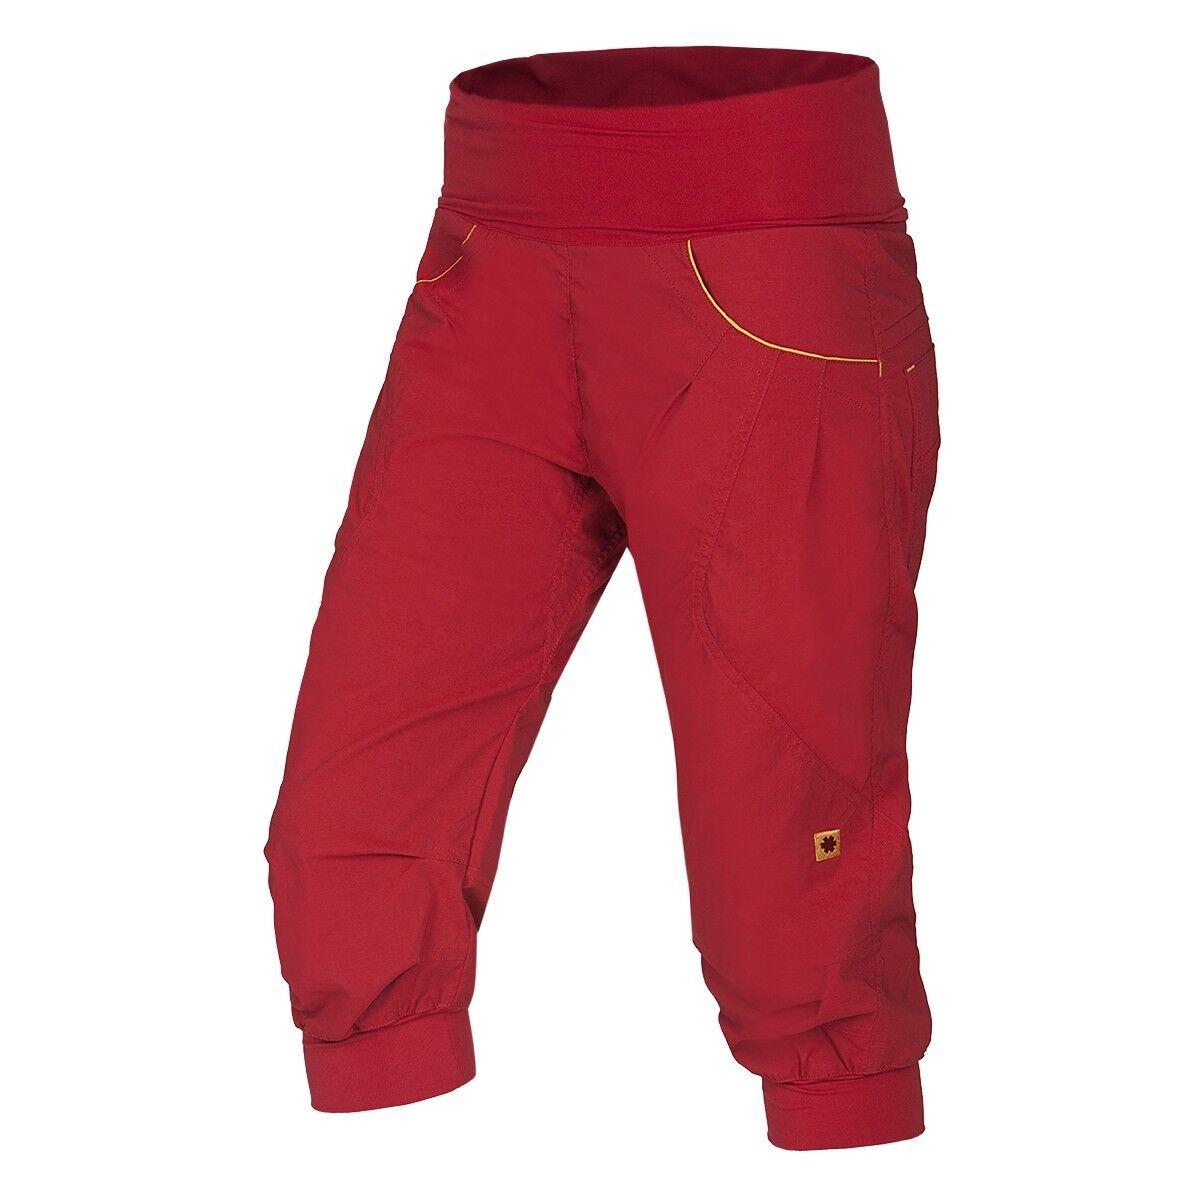 Ocun Noya Short Mujer ,3 4-Lange Pantalones para Escalar Mujer,Rojo -